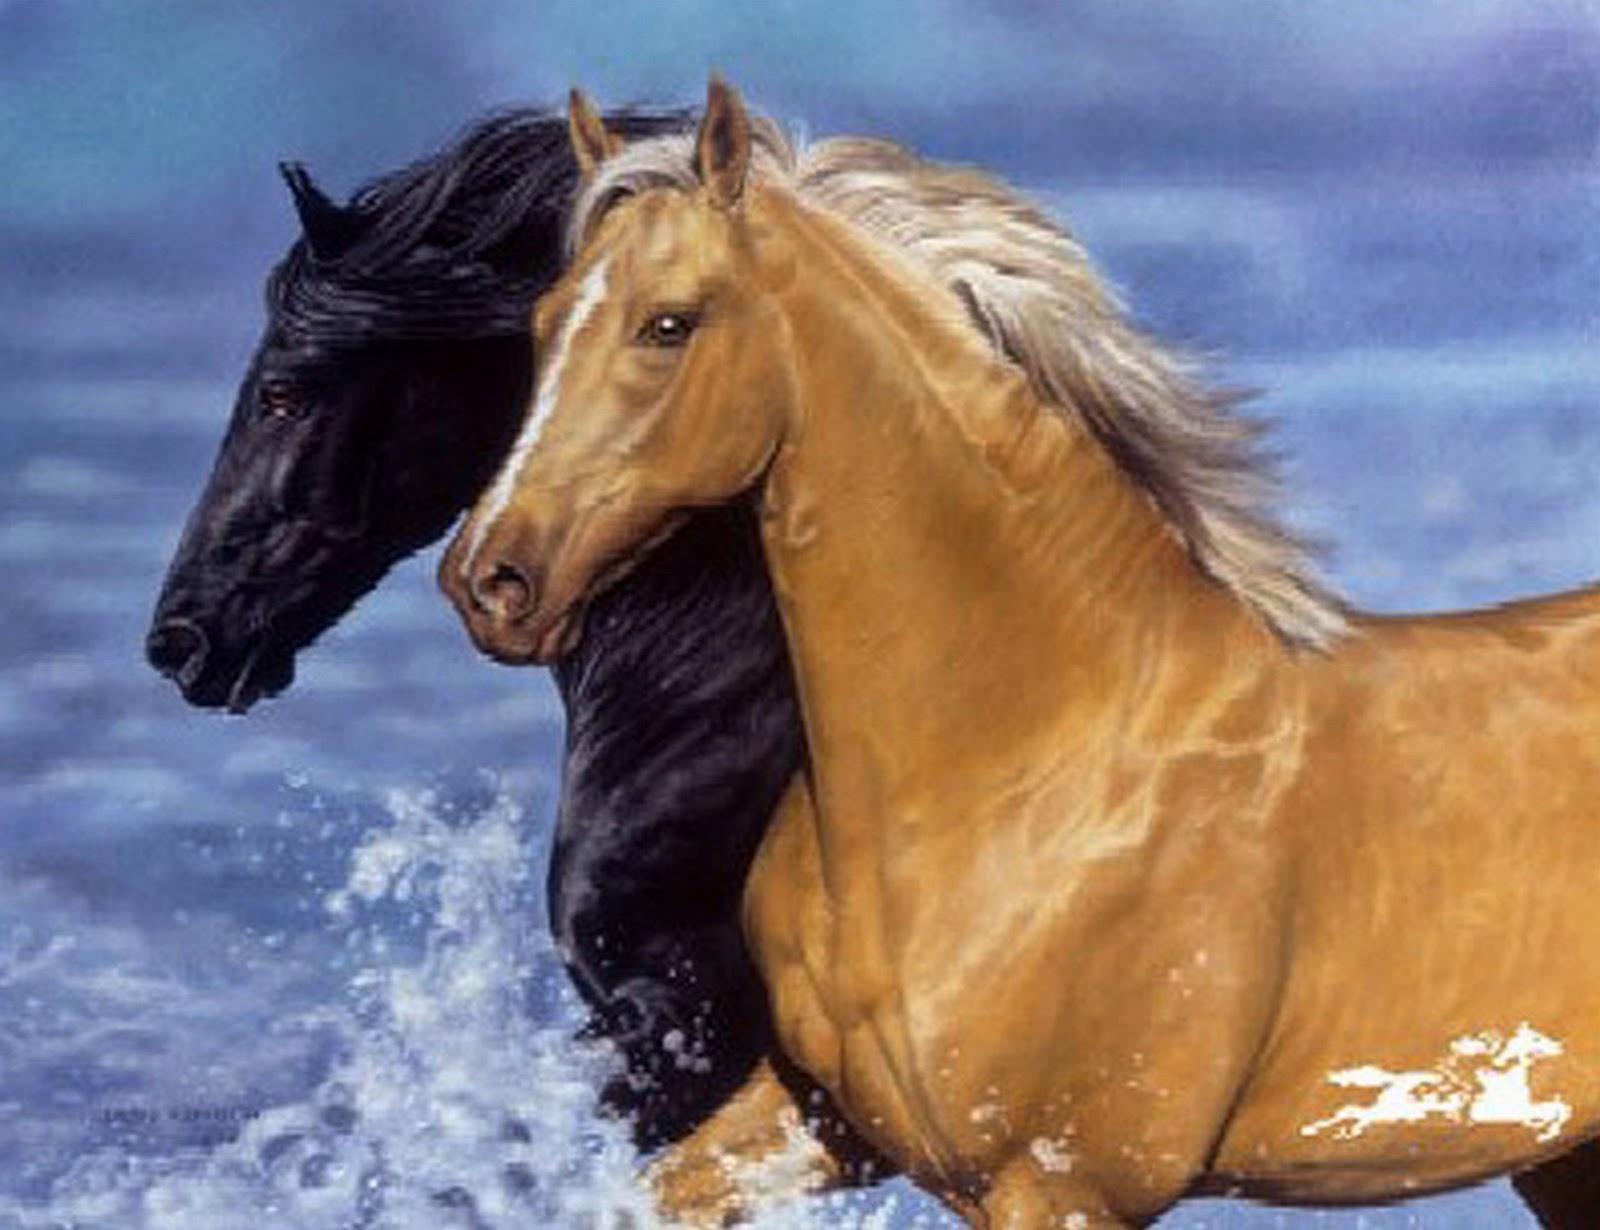 Pinturas al oleo paisajes caballos desnudos abstractos for Cuadros al oleo modernos